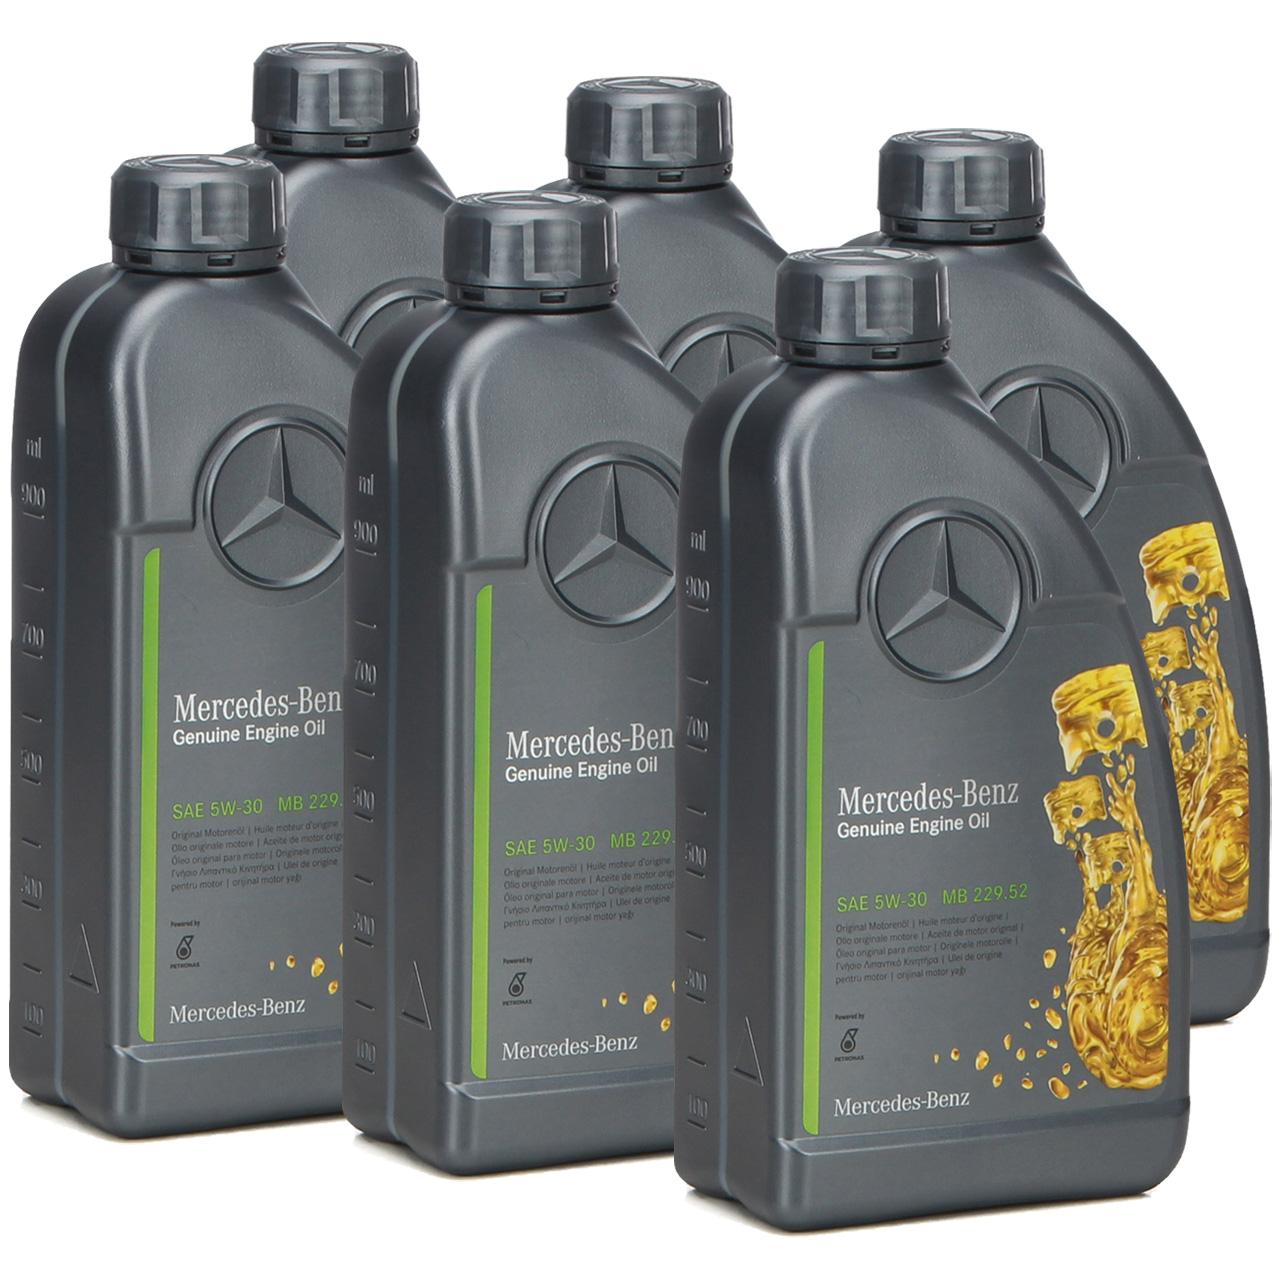 6L 6 Liter ORIGINAL Mercedes-Benz Motoröl ÖL 5W30 5W-30 MB 229.52 000989950211